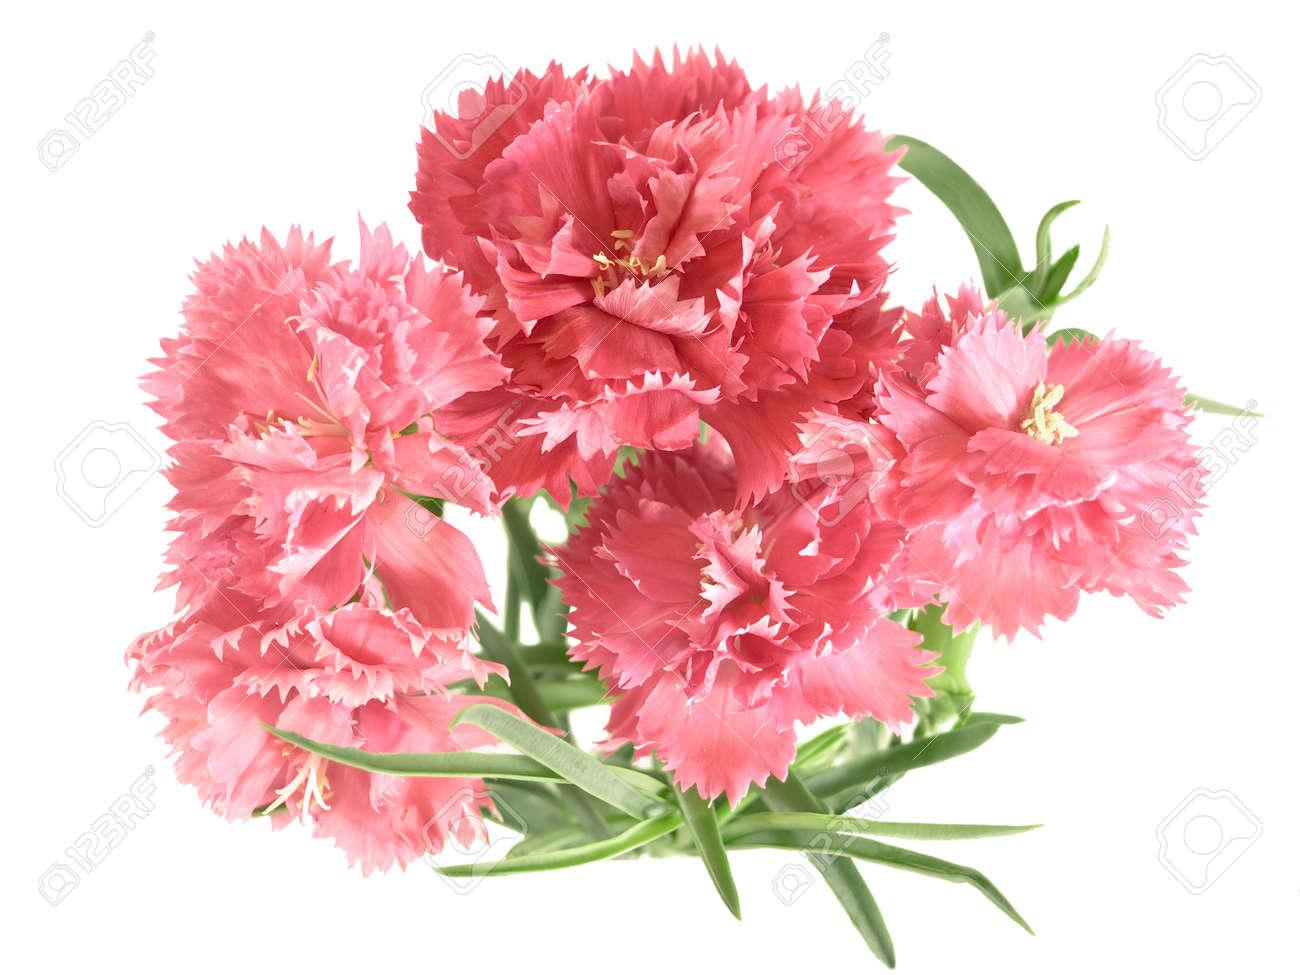 posy of carnations isolated on white background Stock Photo - 4404019